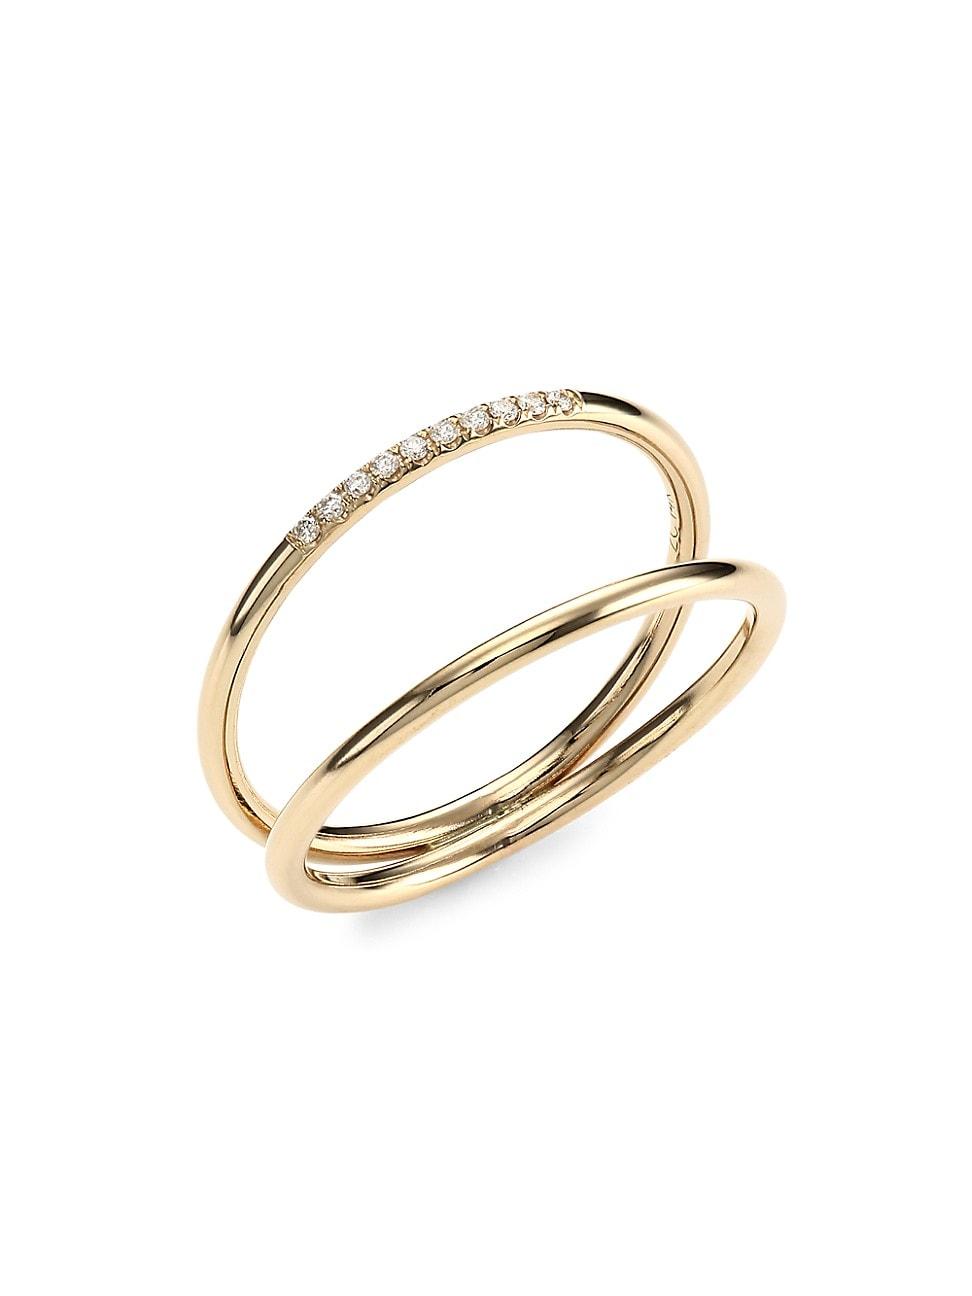 Zoë Chicco Women's 14k Yellow Gold & Diamond Double-band Ring